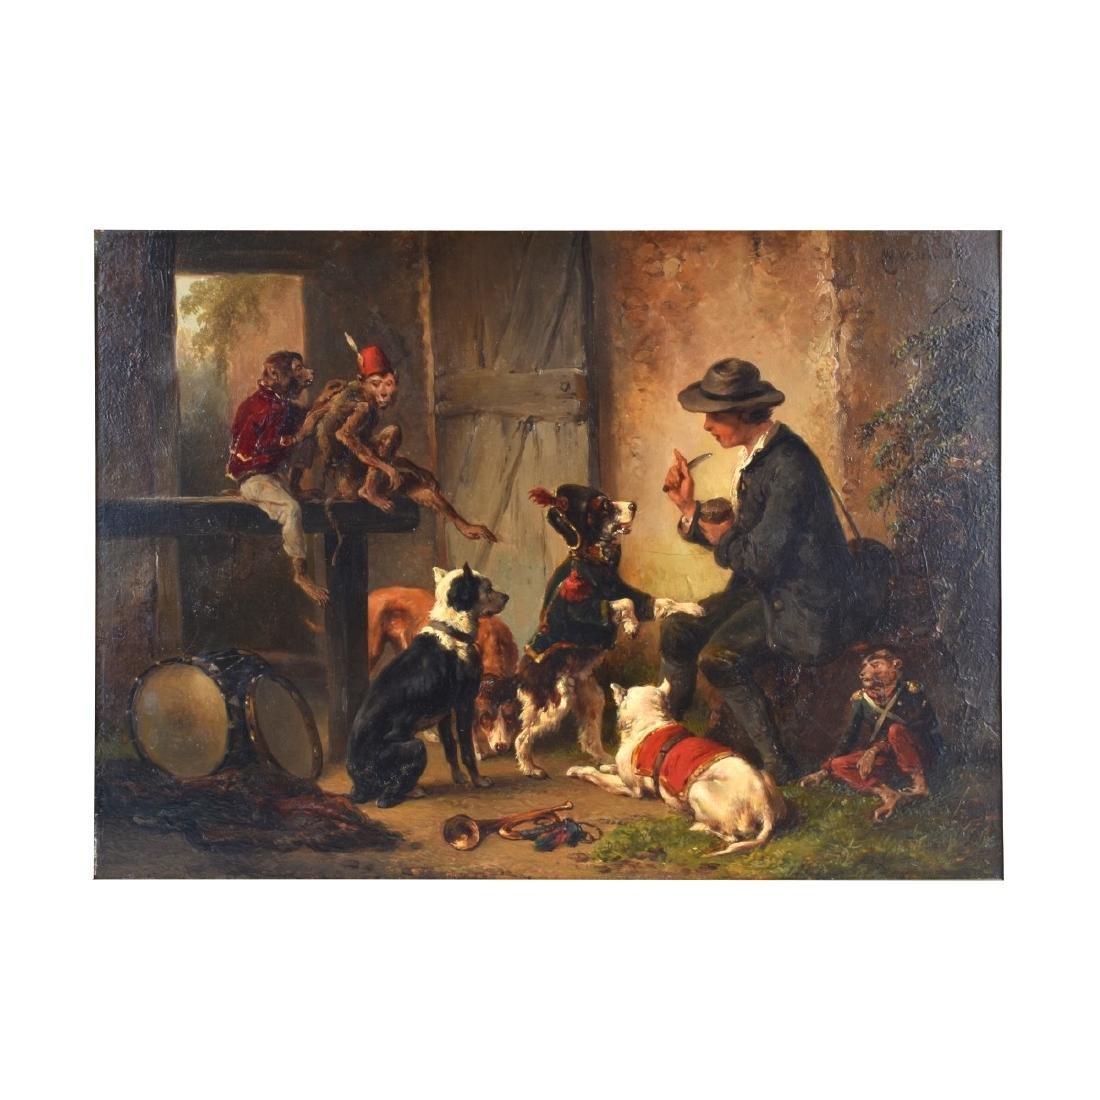 Wouterus Verschuur I, Dutch (1812 - 1874) O/P